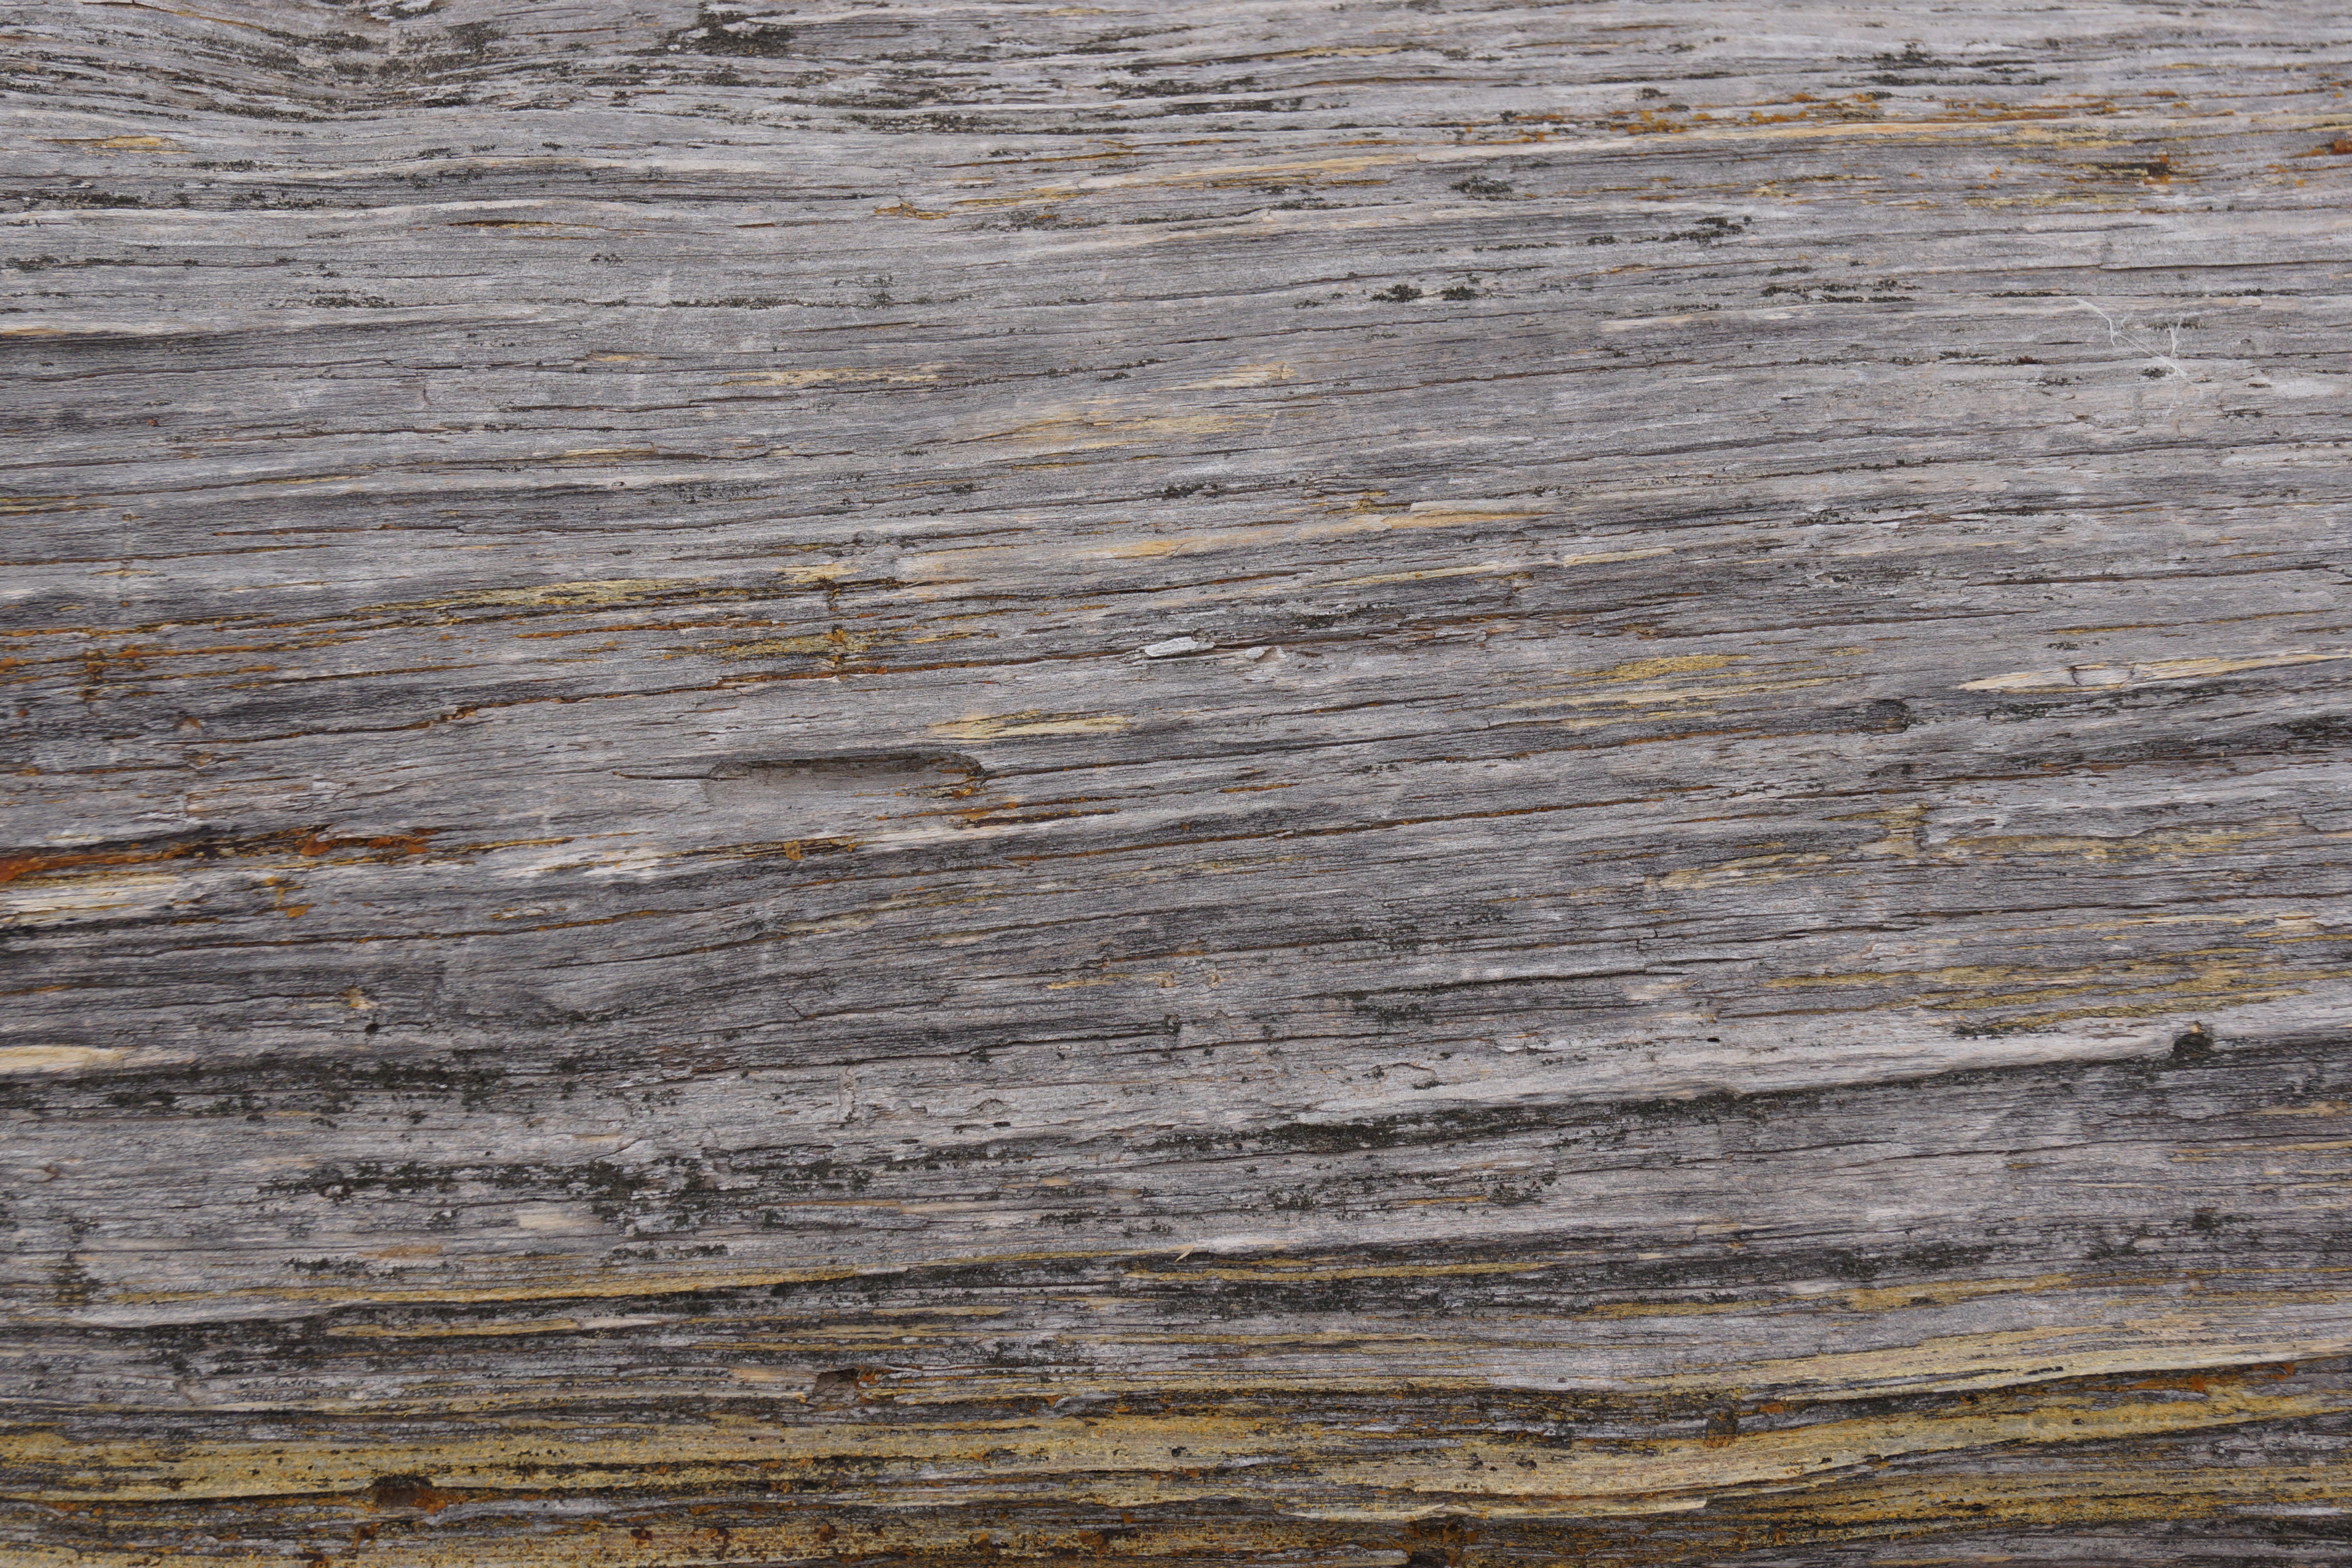 Free High Rez Grunge Texture Download Grainy Wood Grain | CreateMePink